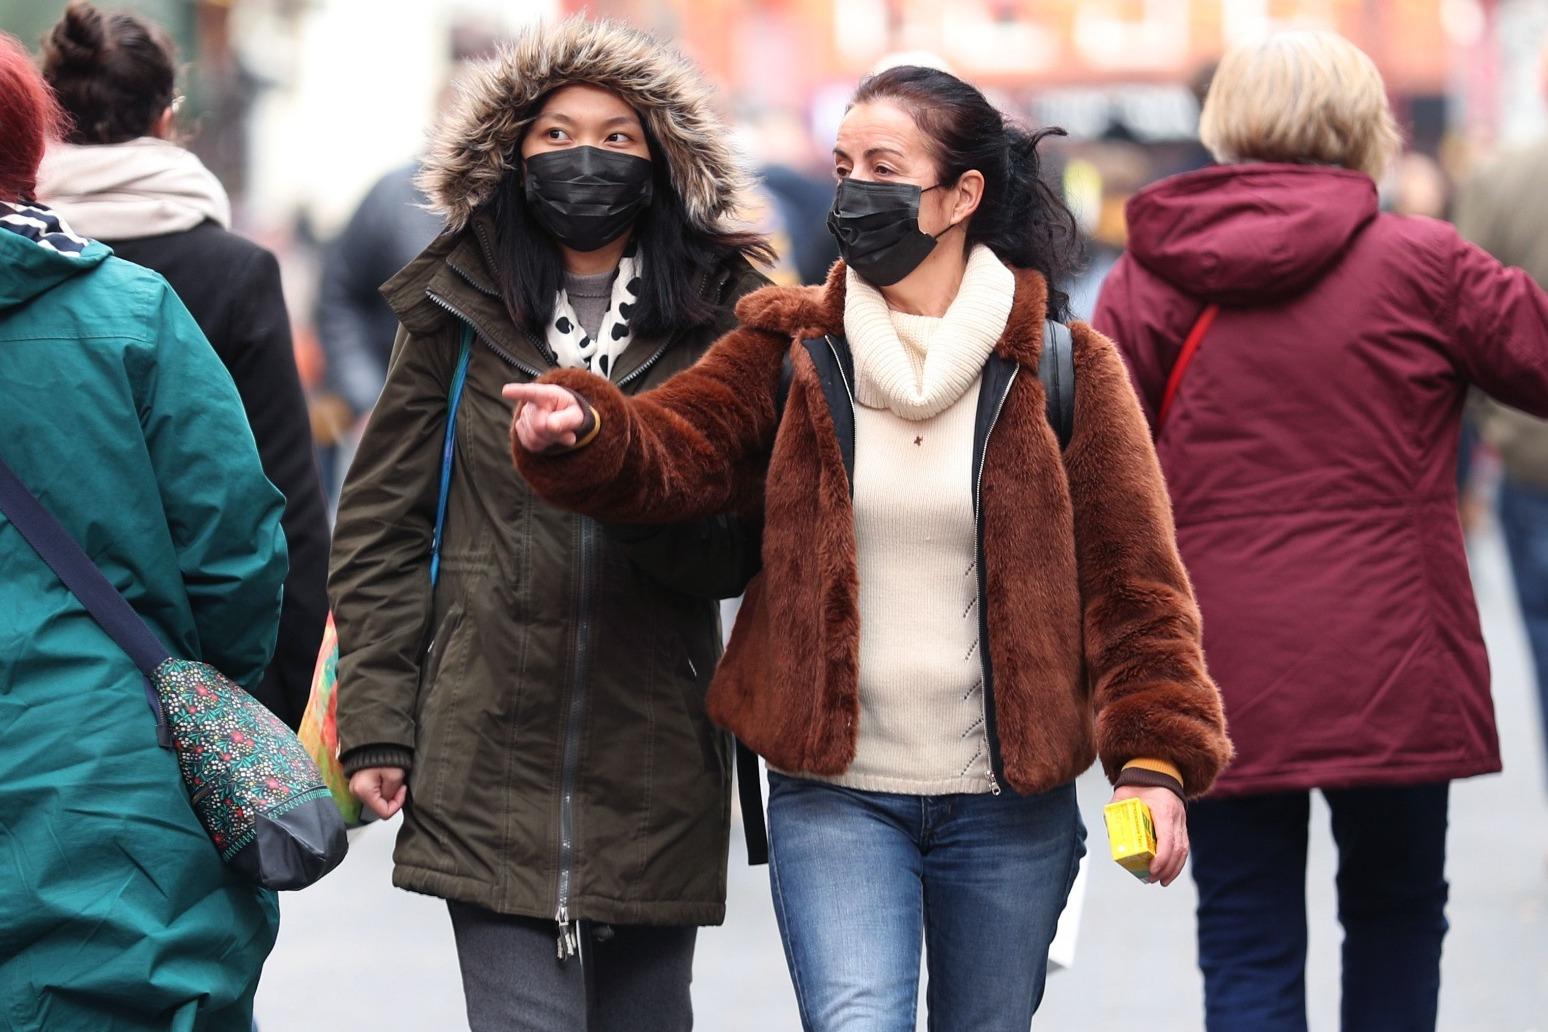 Government to do everything to stop coronavirus spread